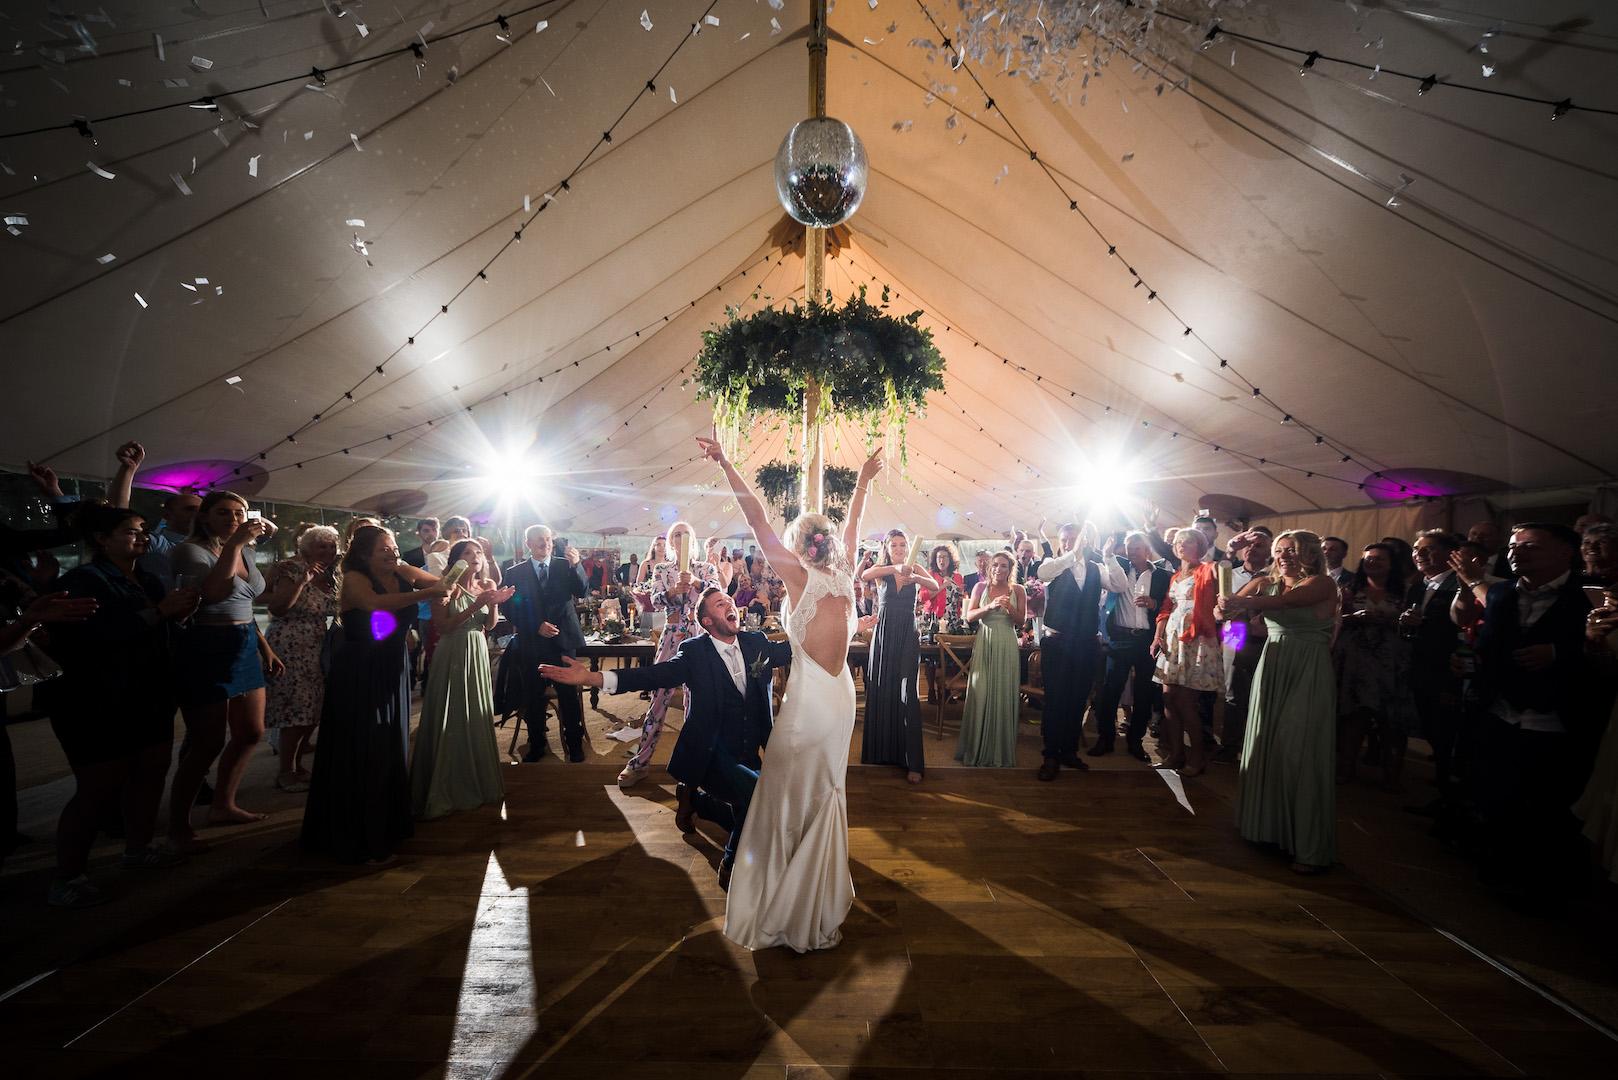 Sarah and Joe's PapaKata Sperry Wedding: First Dance